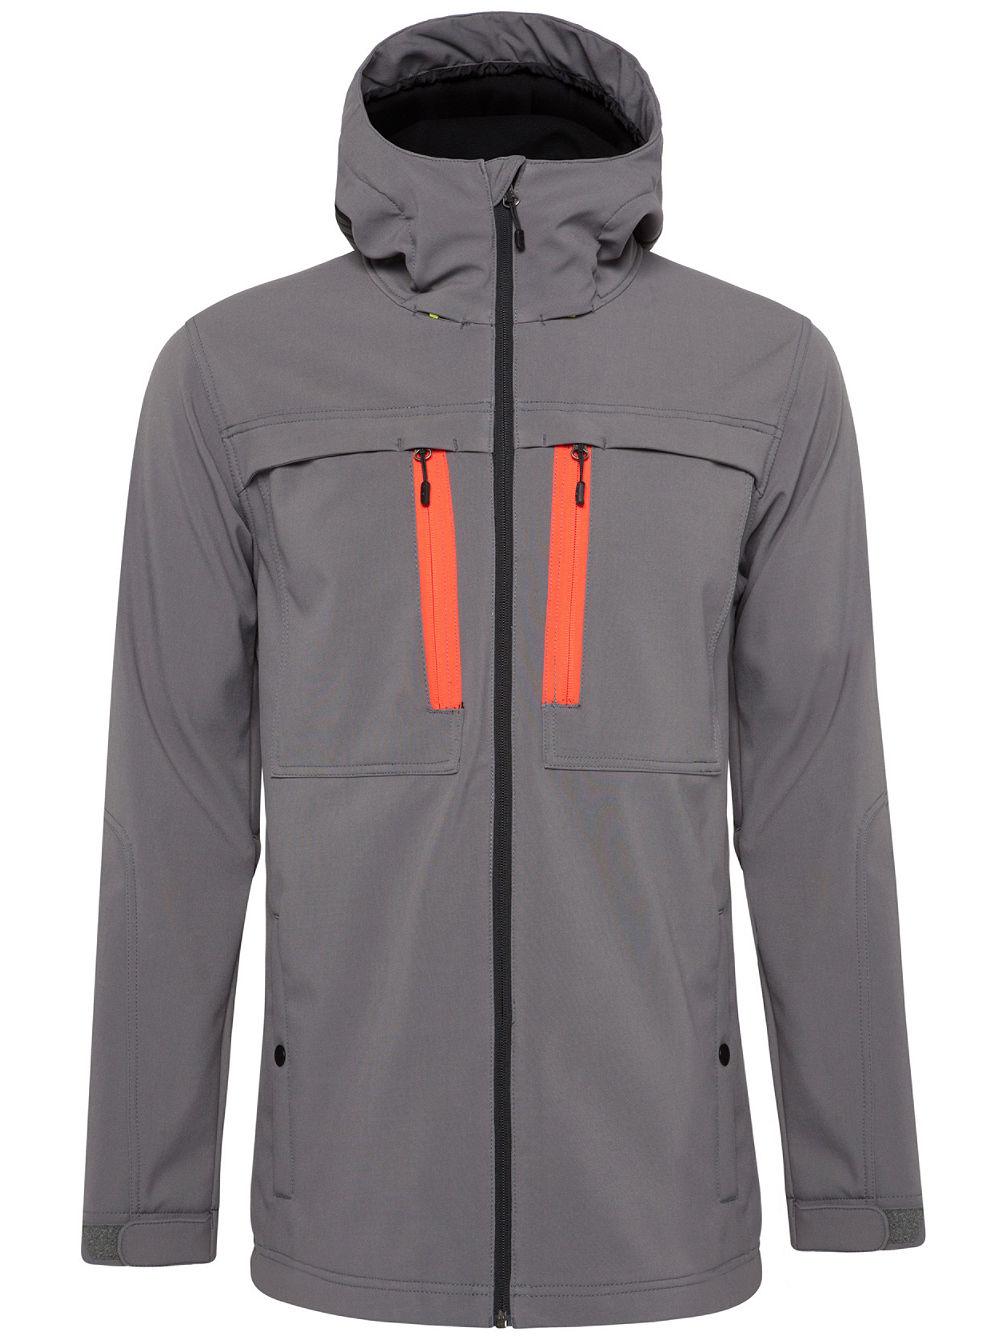 o-neill-radar-softshell-jacket